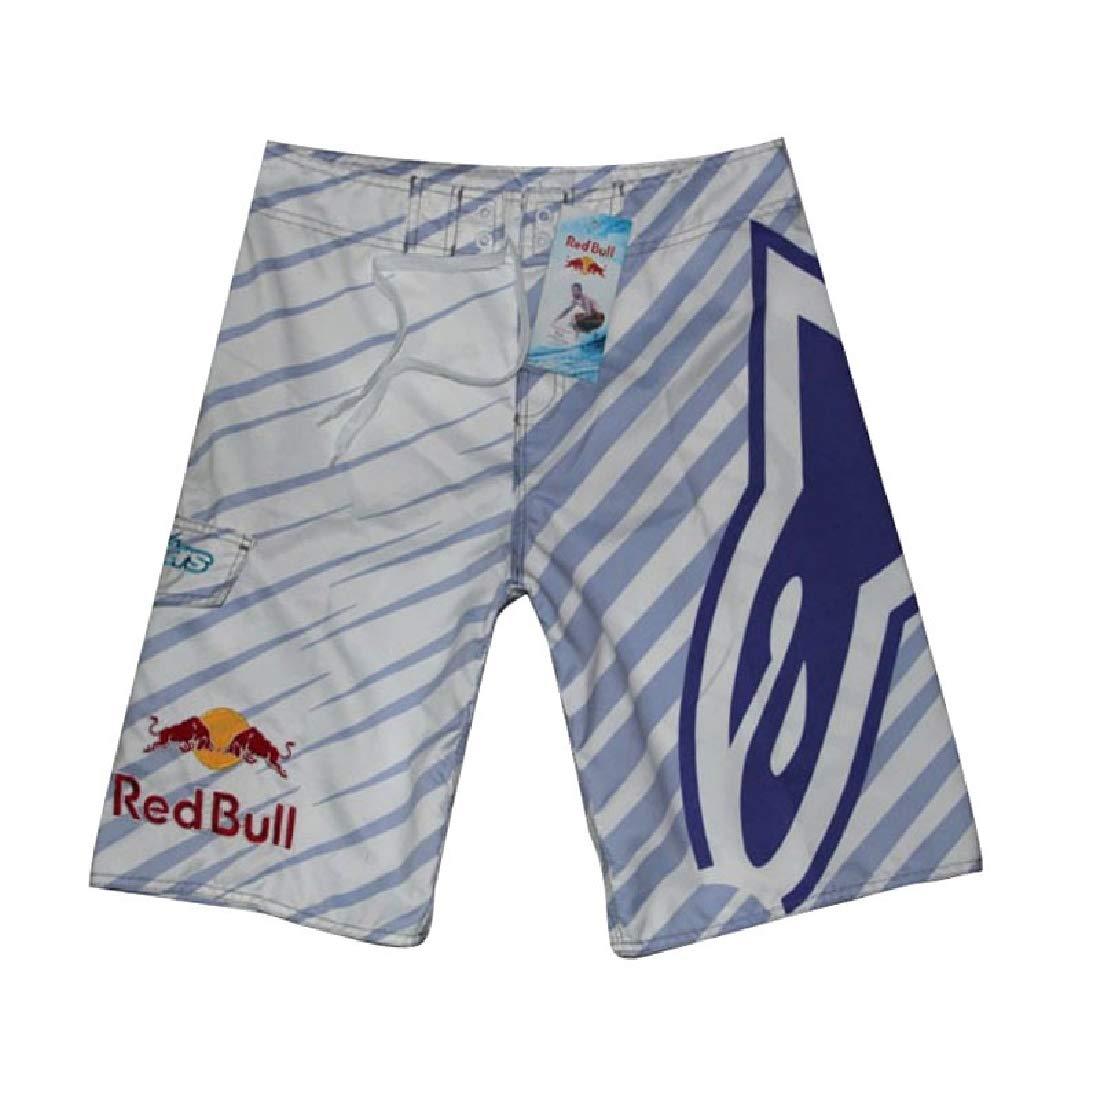 Vska Men Shorts Fitness Quick Dry Sport Casual Printing Beach Trousers